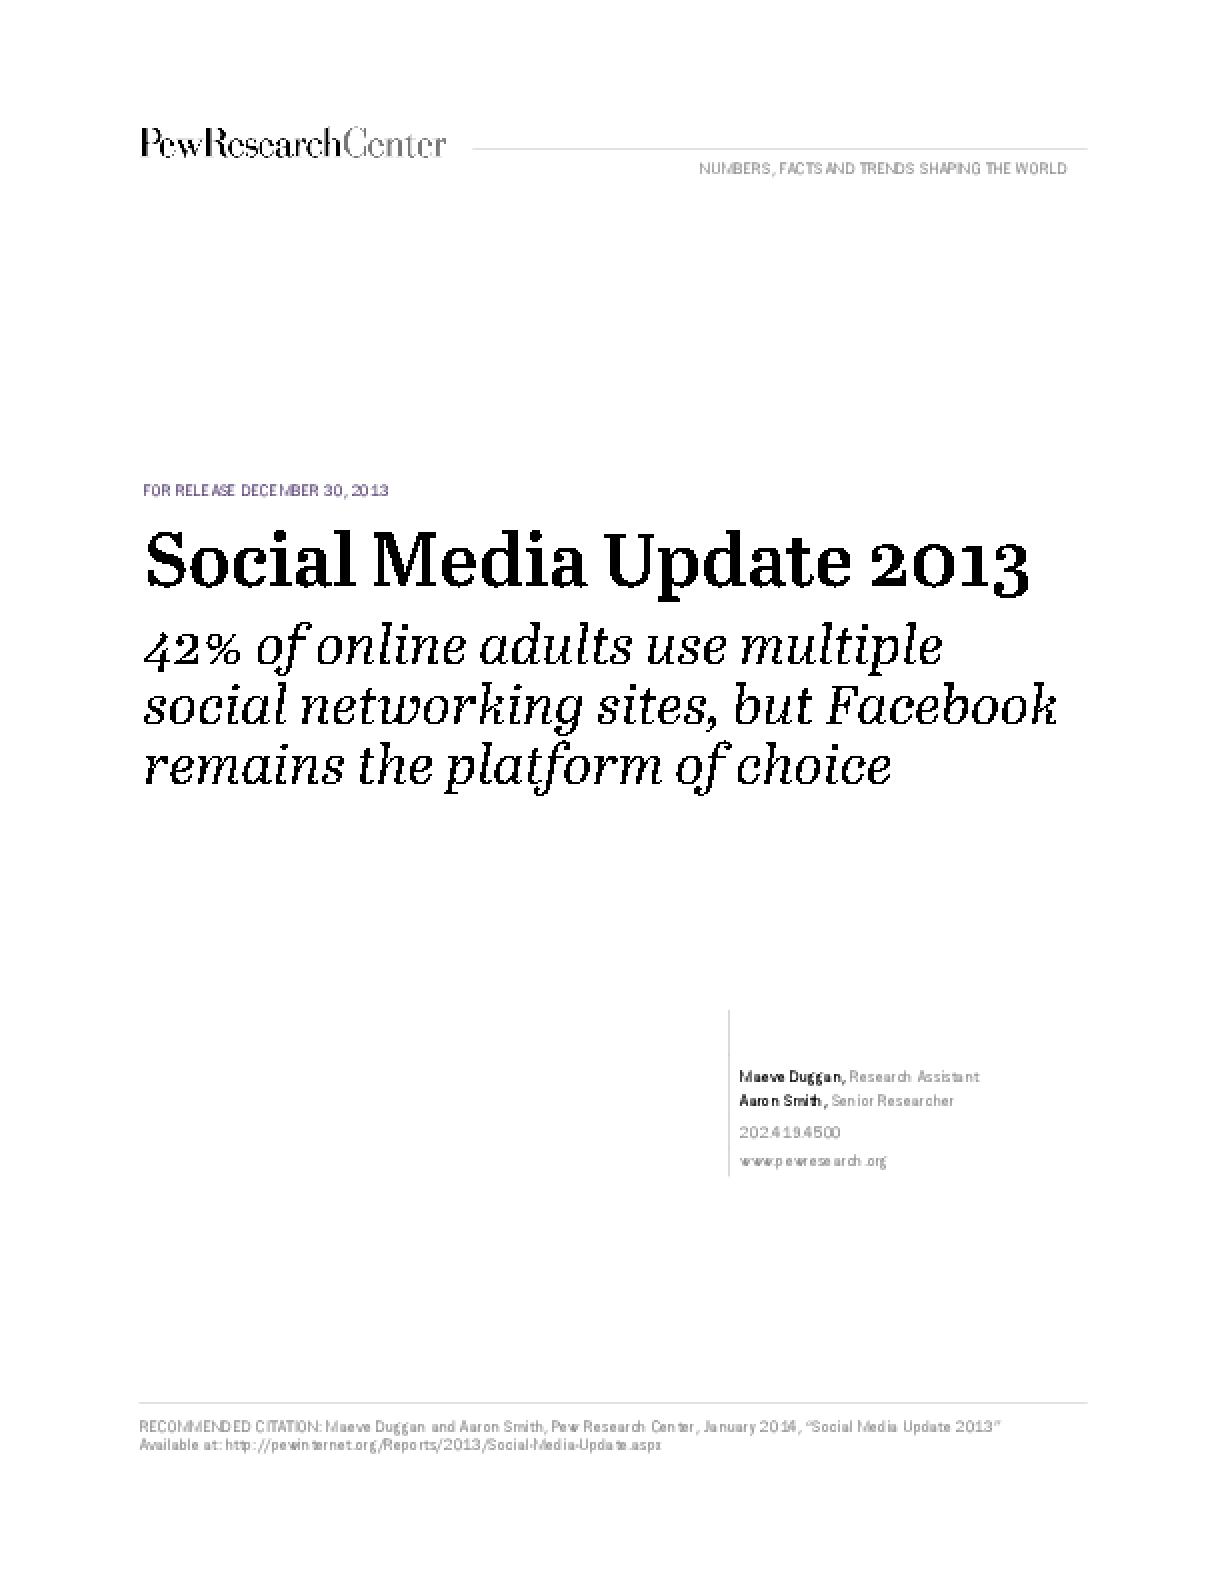 Social Media Update 2013